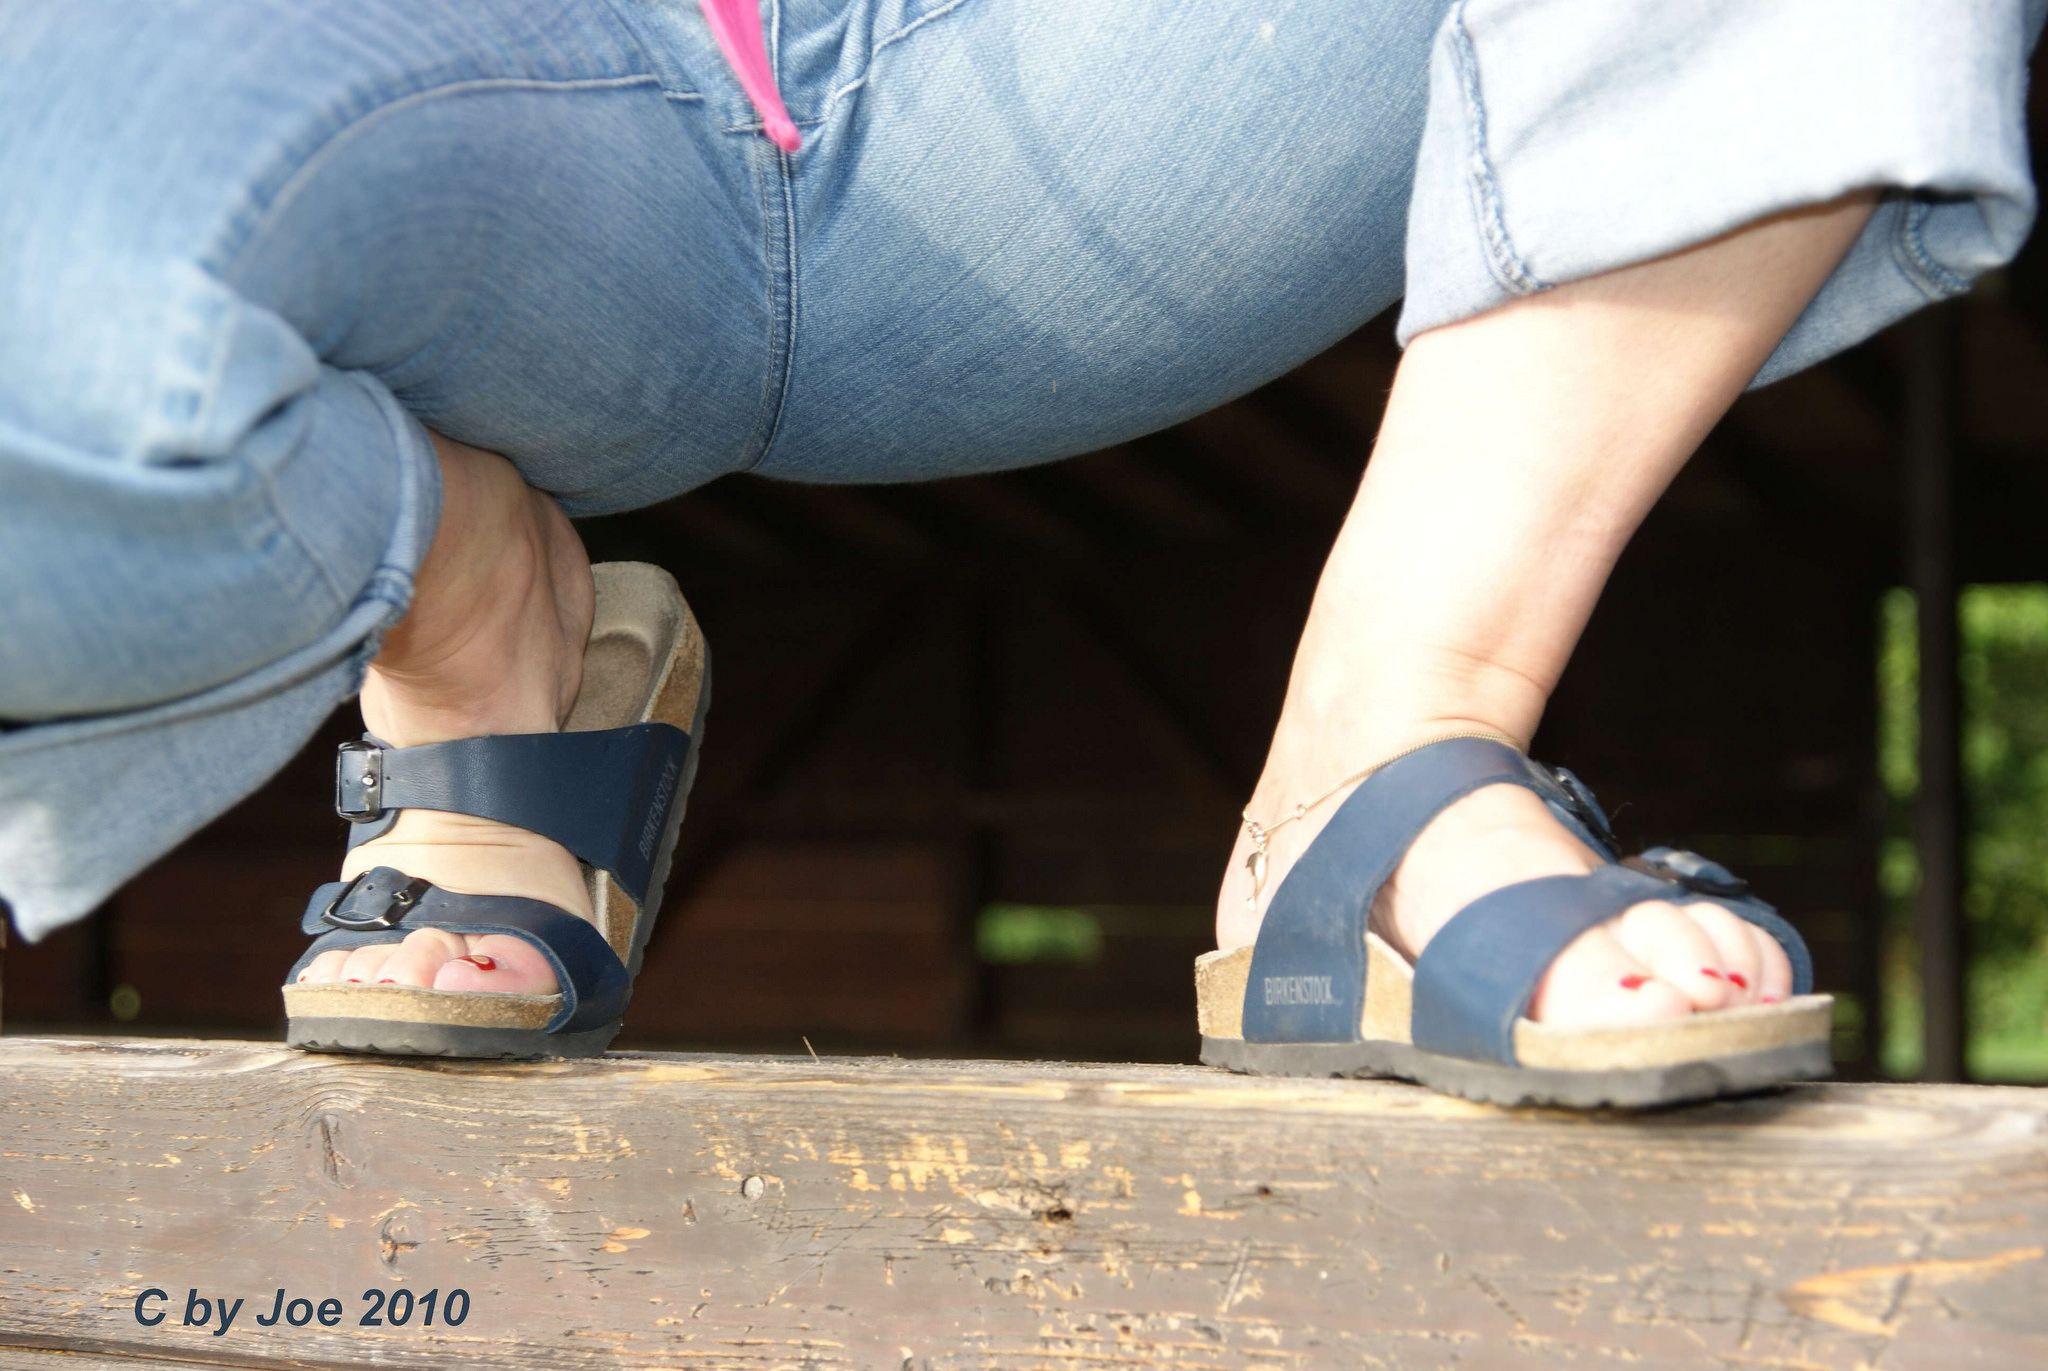 DSC07625   Birkenstock shoes   Birkenstock, Guten rutsch und